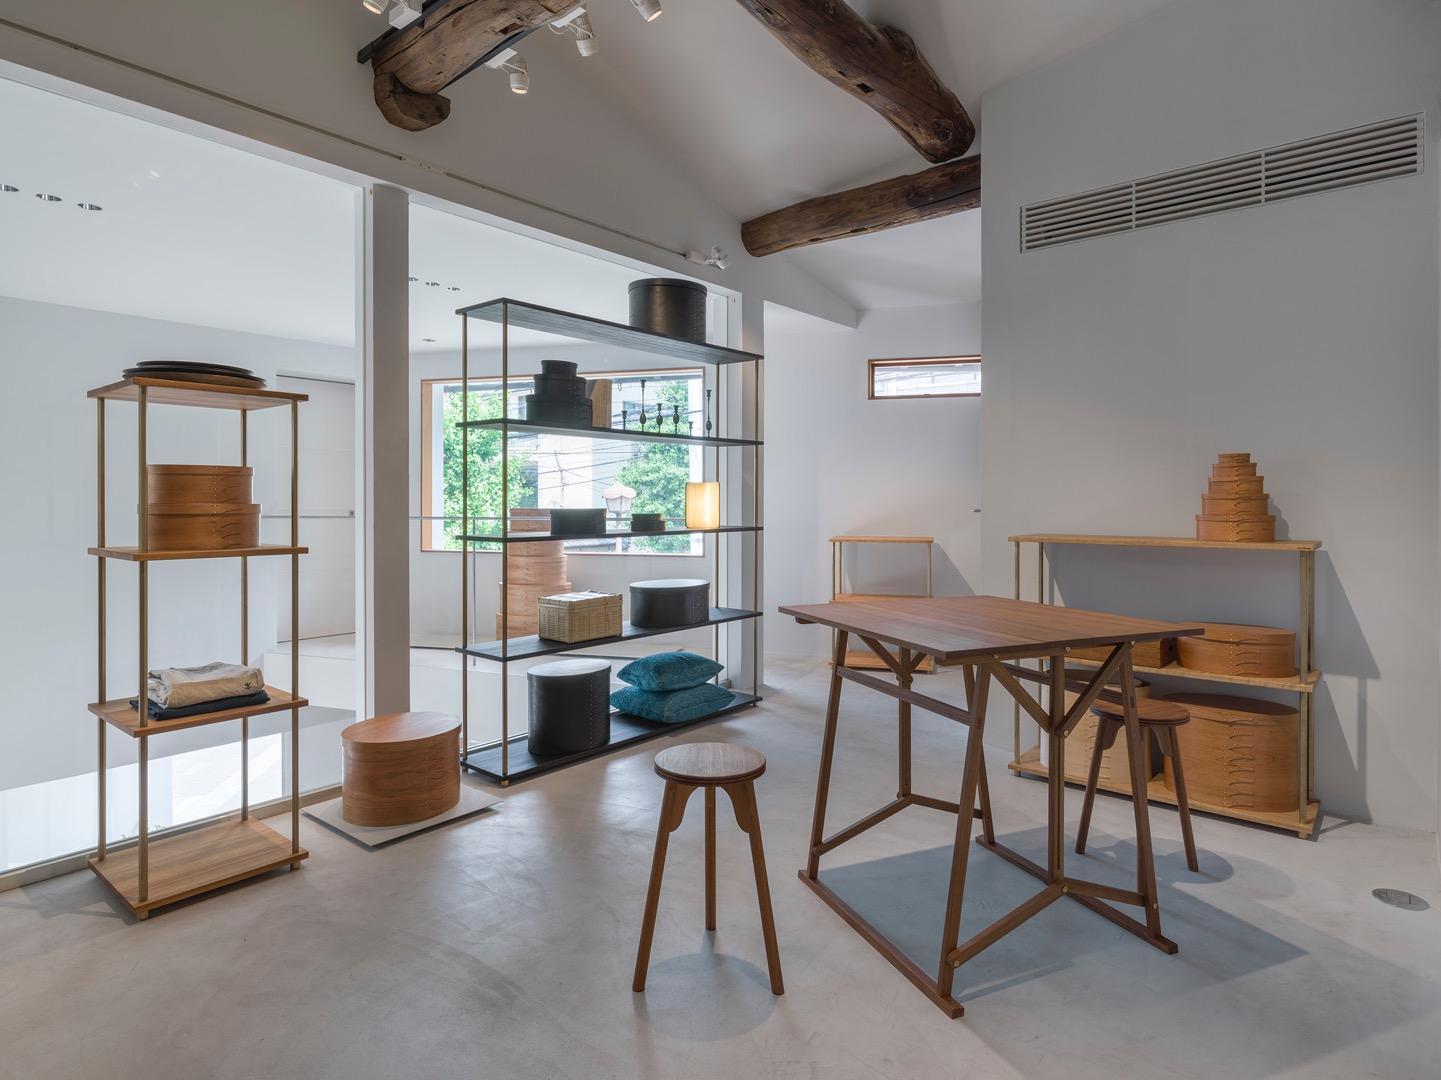 Made to Order Furniture by Ifuji x Arts & Science